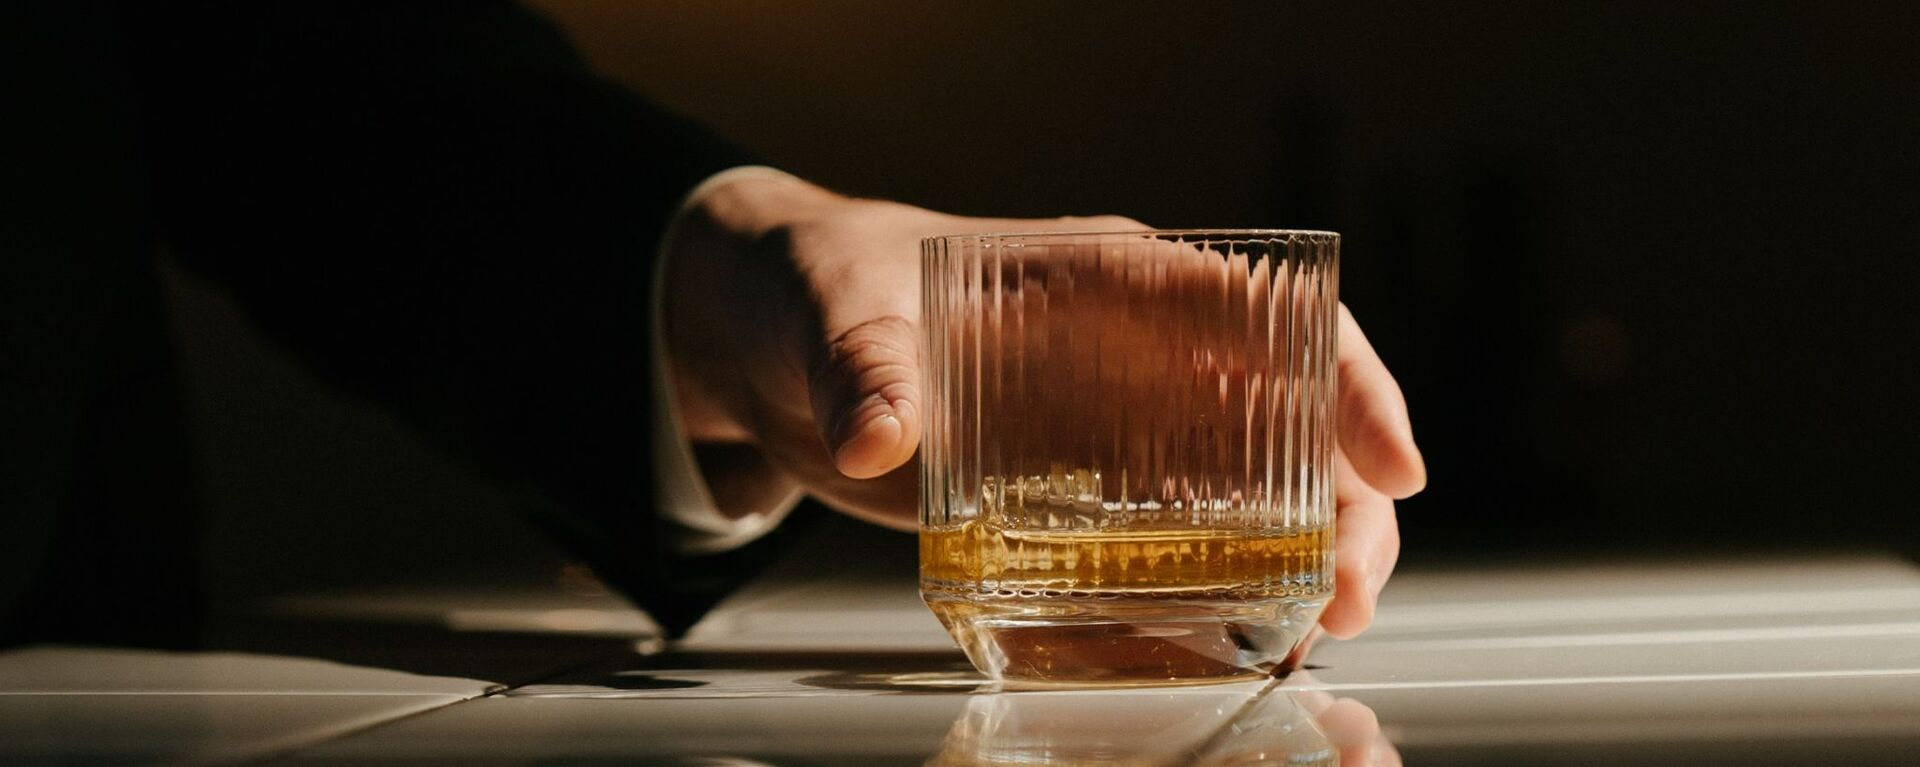 Un vaso de alcohol (imagen referencial) - Sputnik Mundo, 1920, 07.11.2020